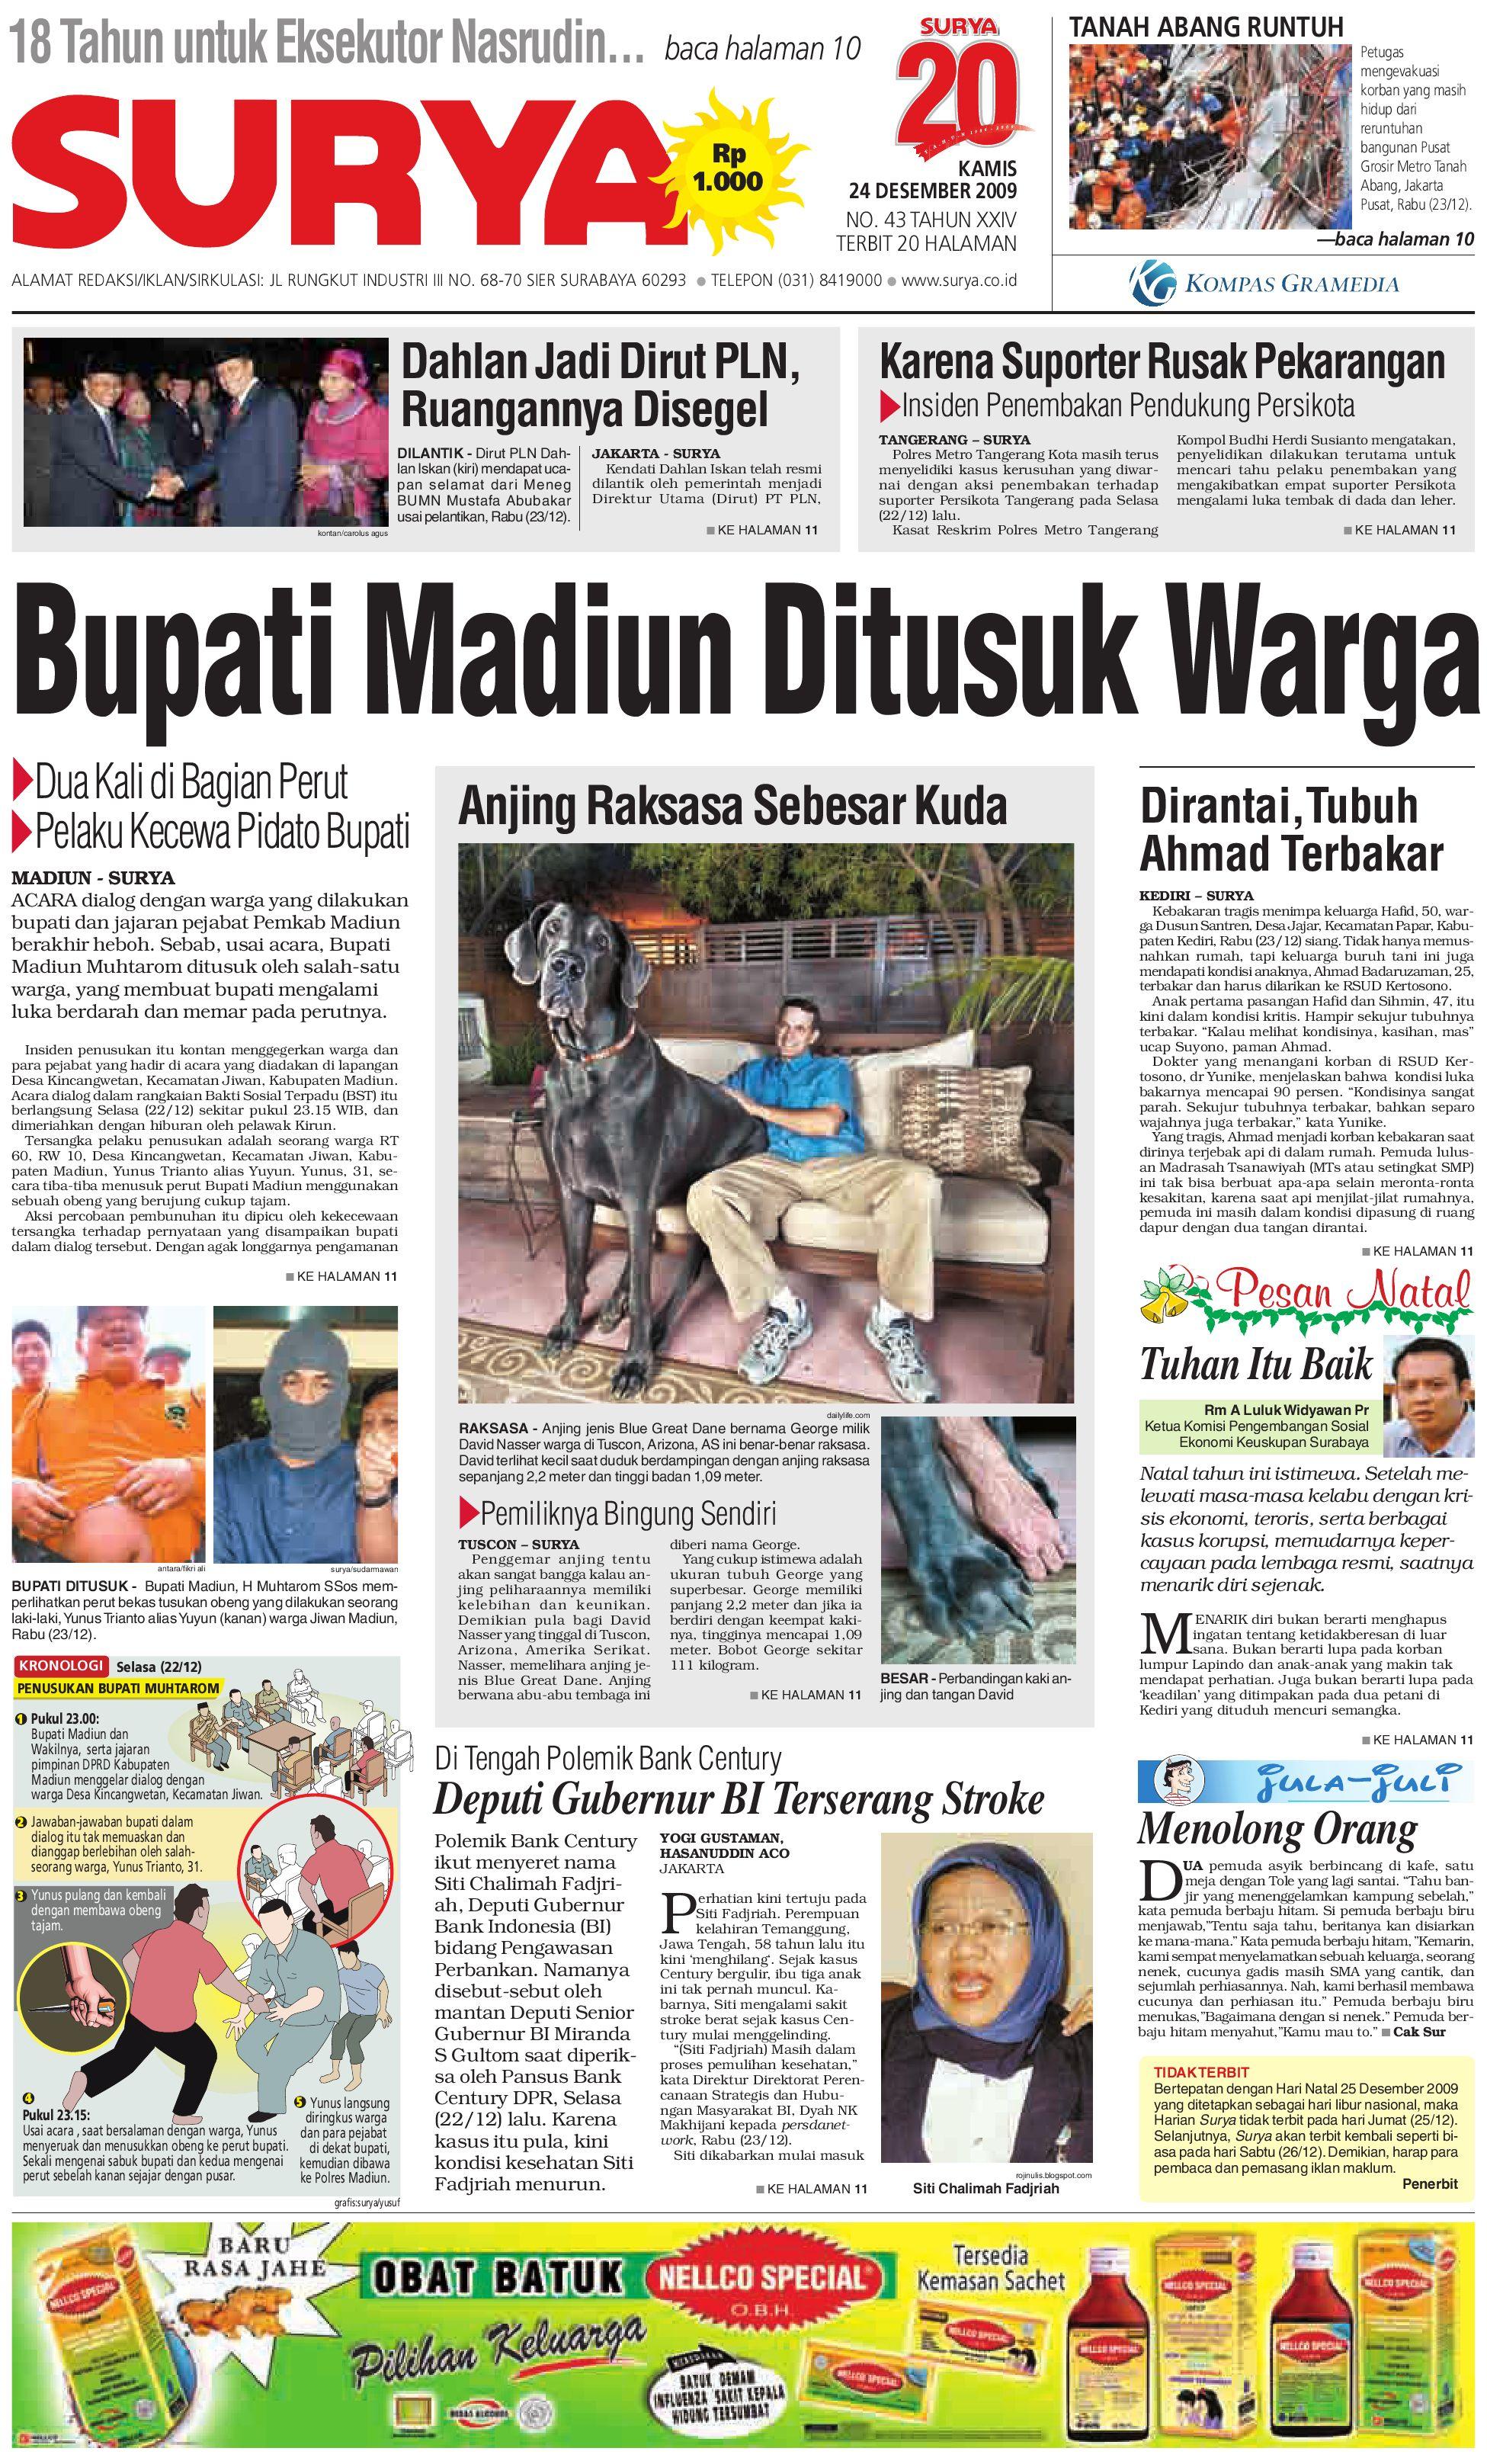 surya edisi cetak 23 okt 2009 by harian surya issuu